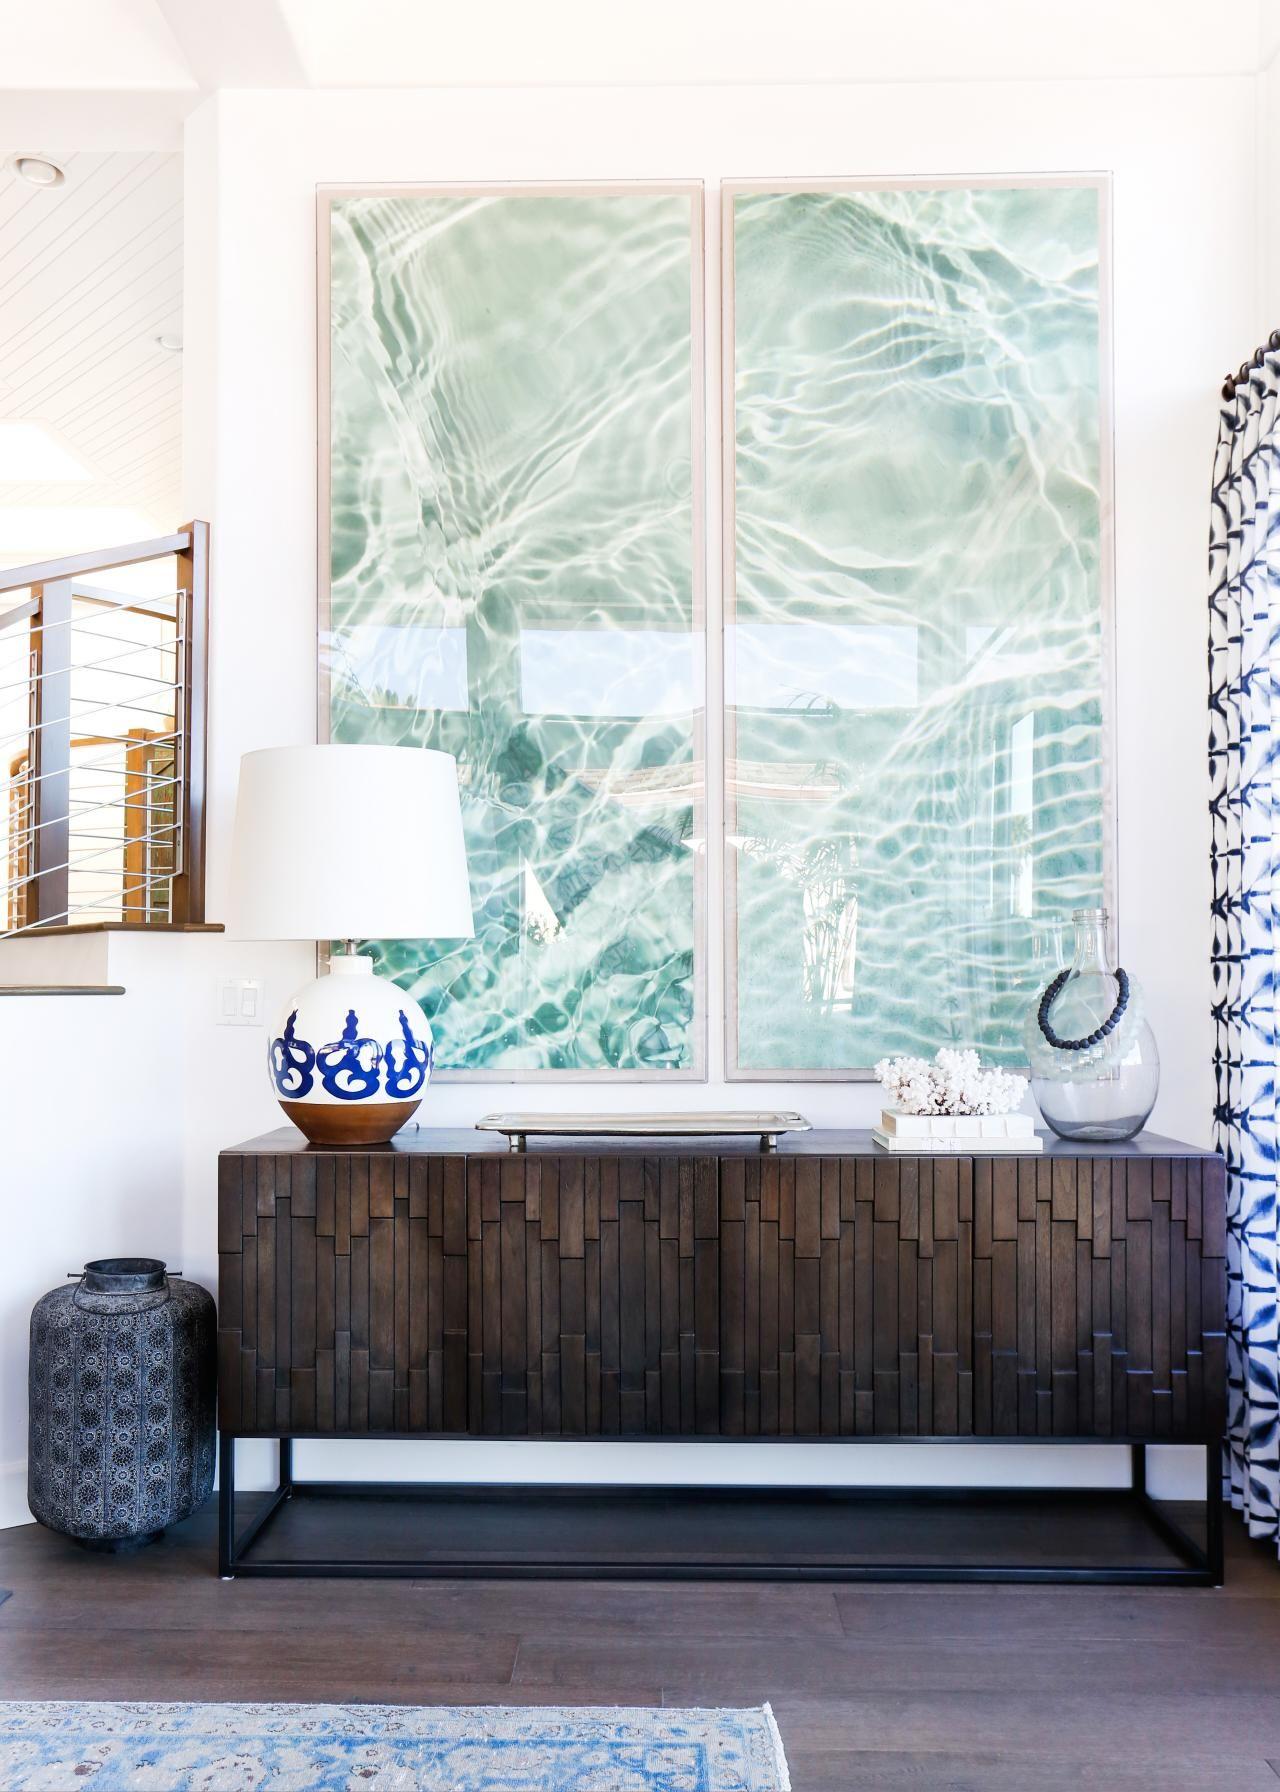 2018 Home Decor Trends Large Scale Art Oversized Art Design